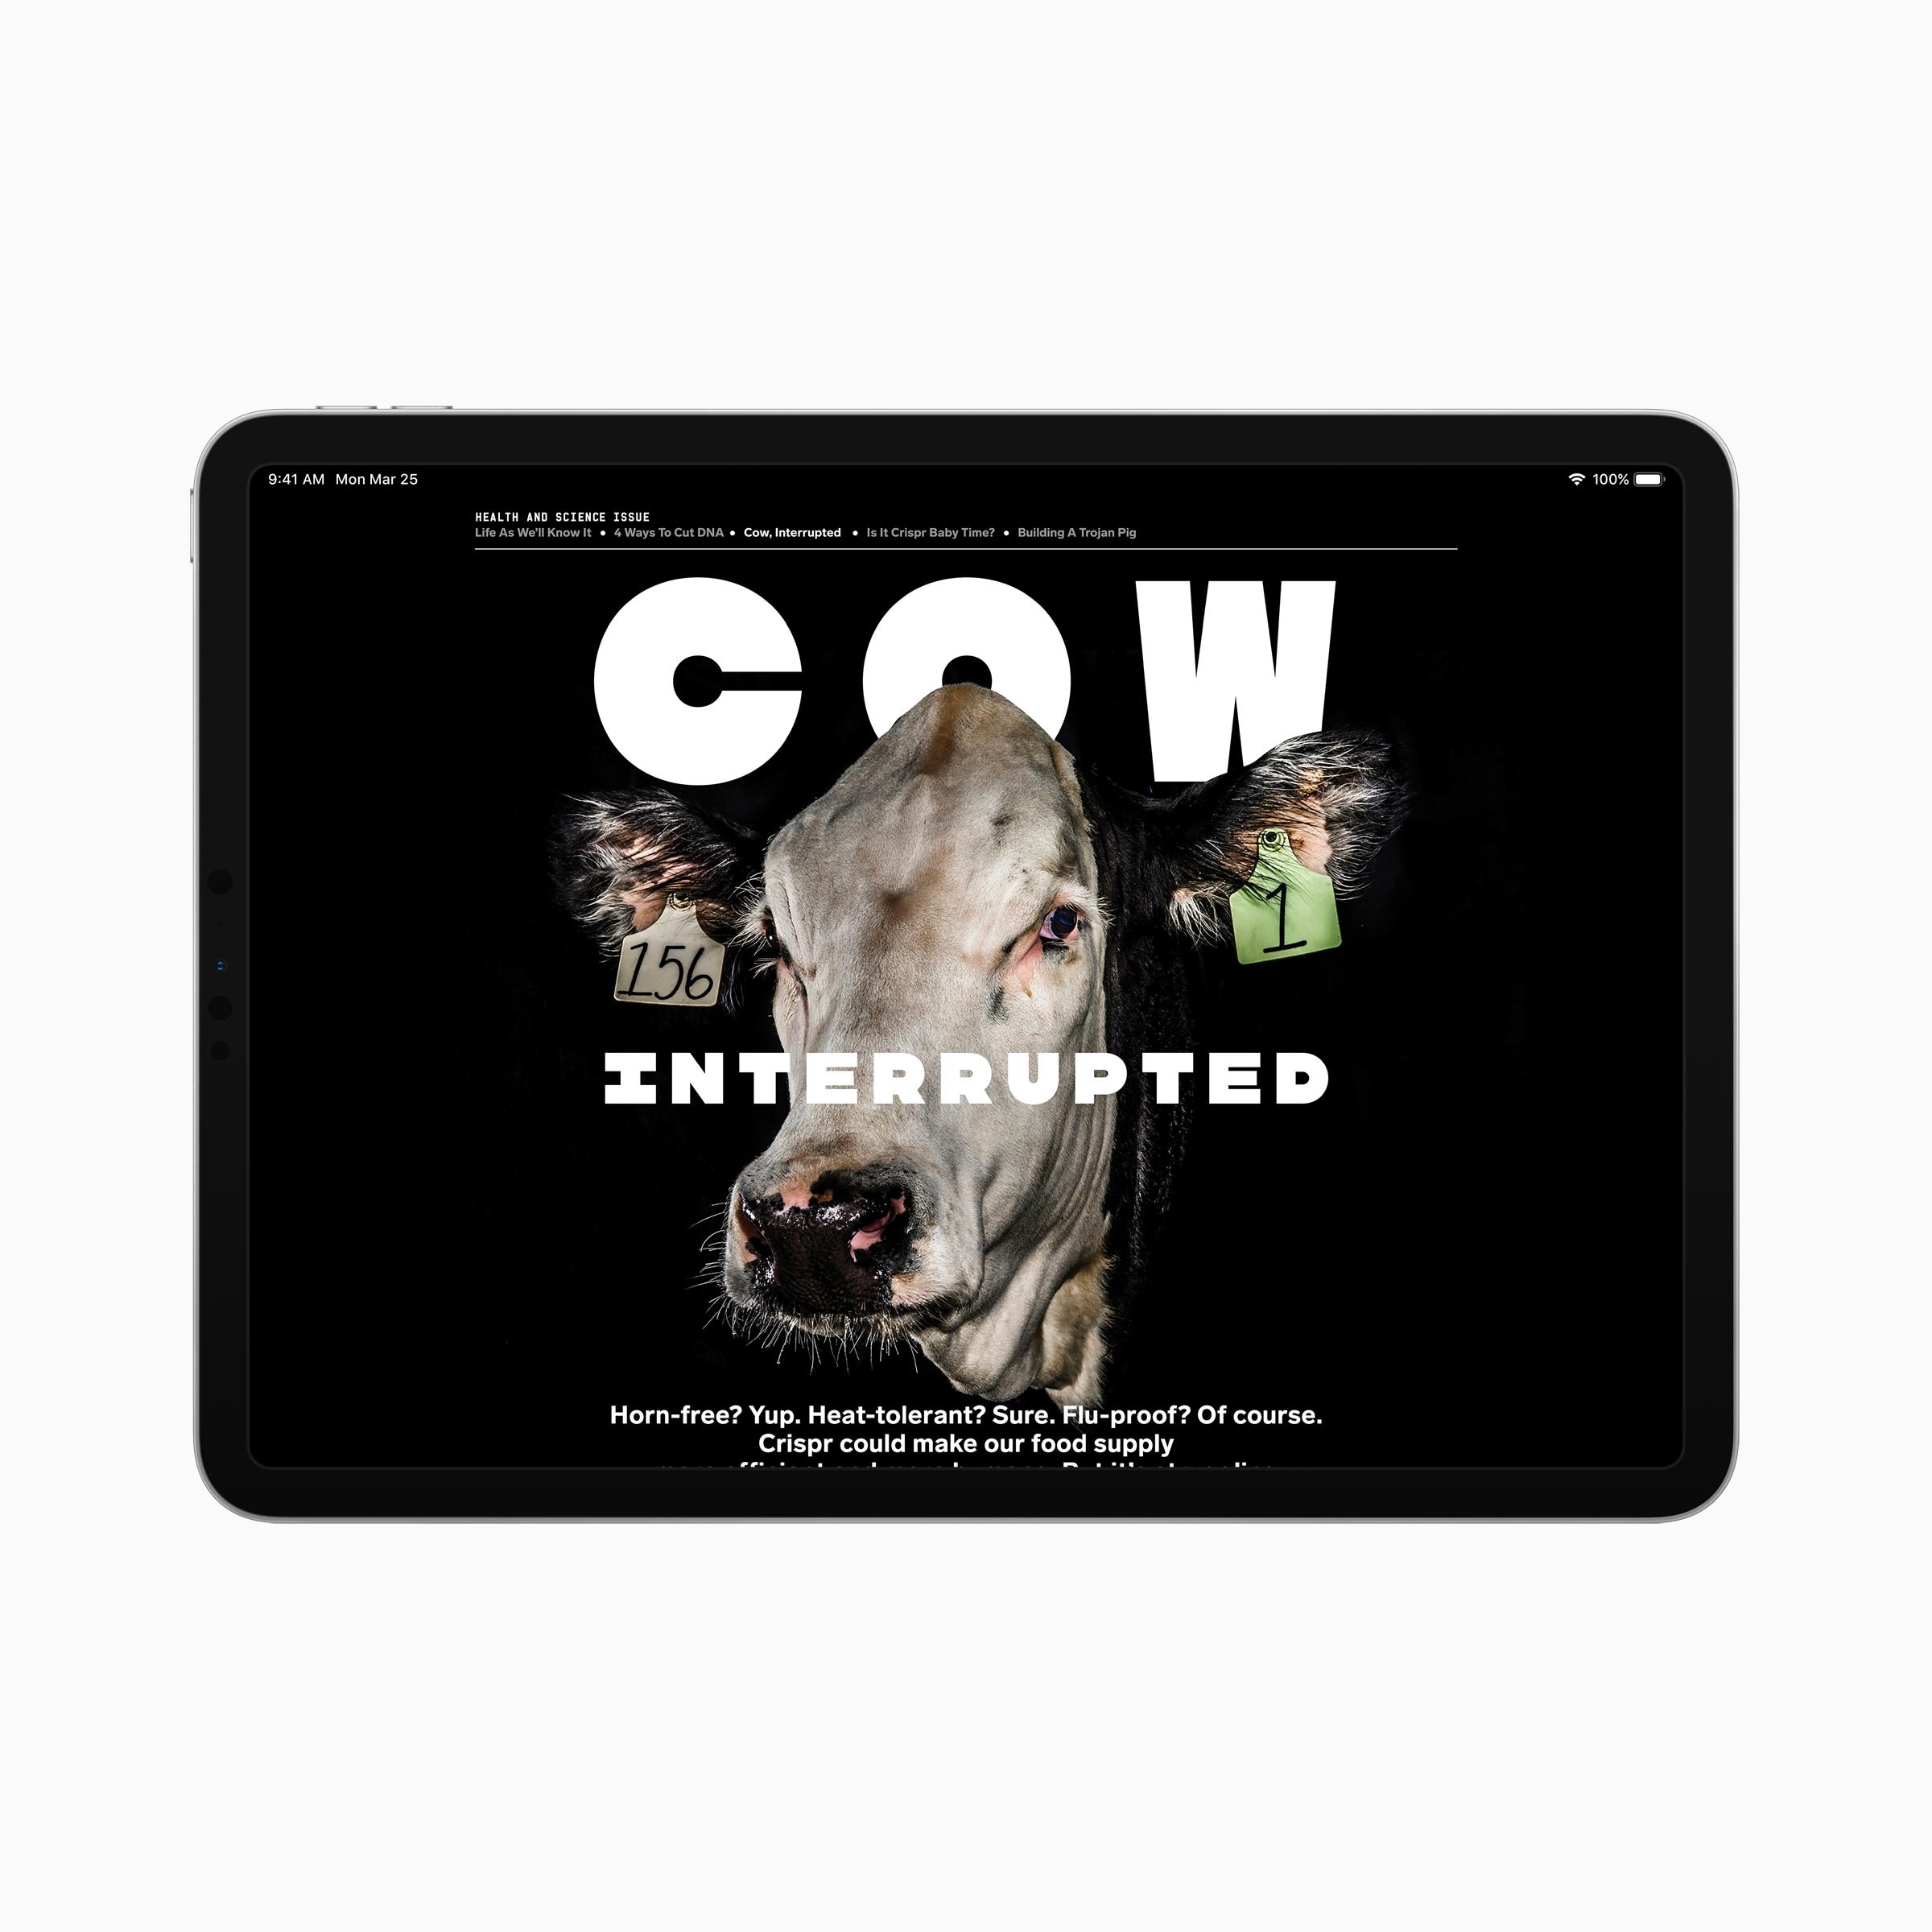 Apple-news-plus-wired-ipad-screen-03252019.jpg